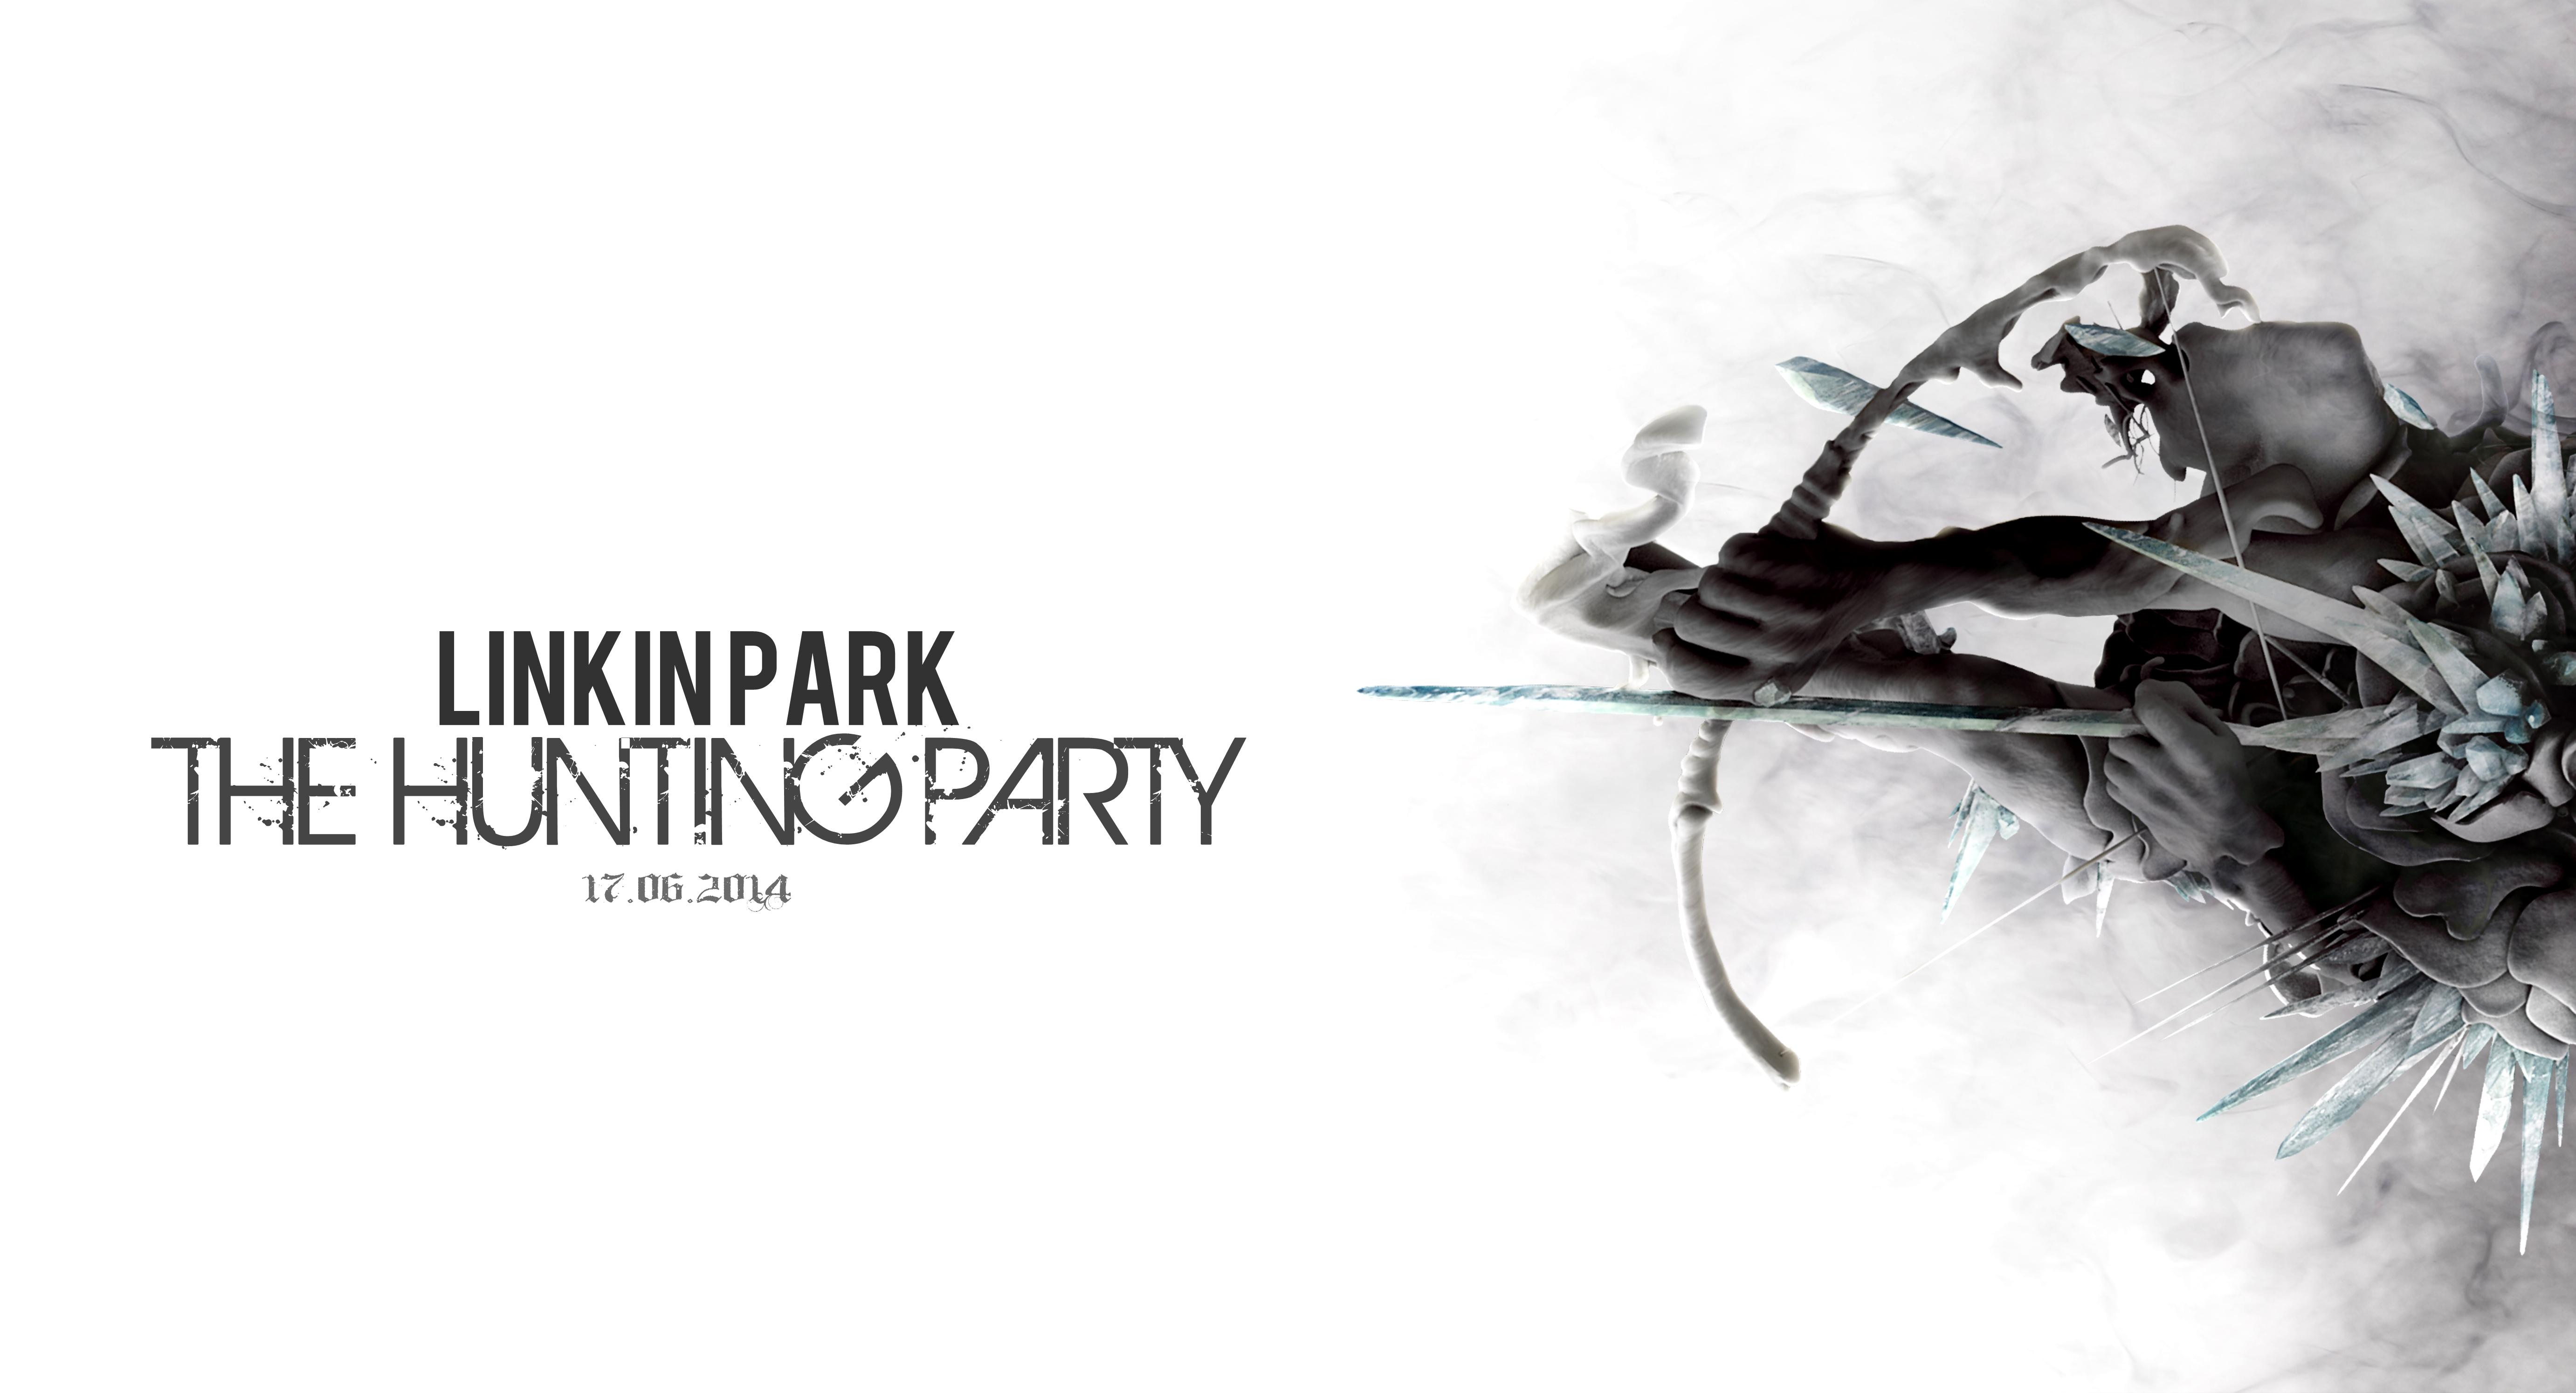 klapaucius linkin park the hunting party album lyrics full songs. Black Bedroom Furniture Sets. Home Design Ideas